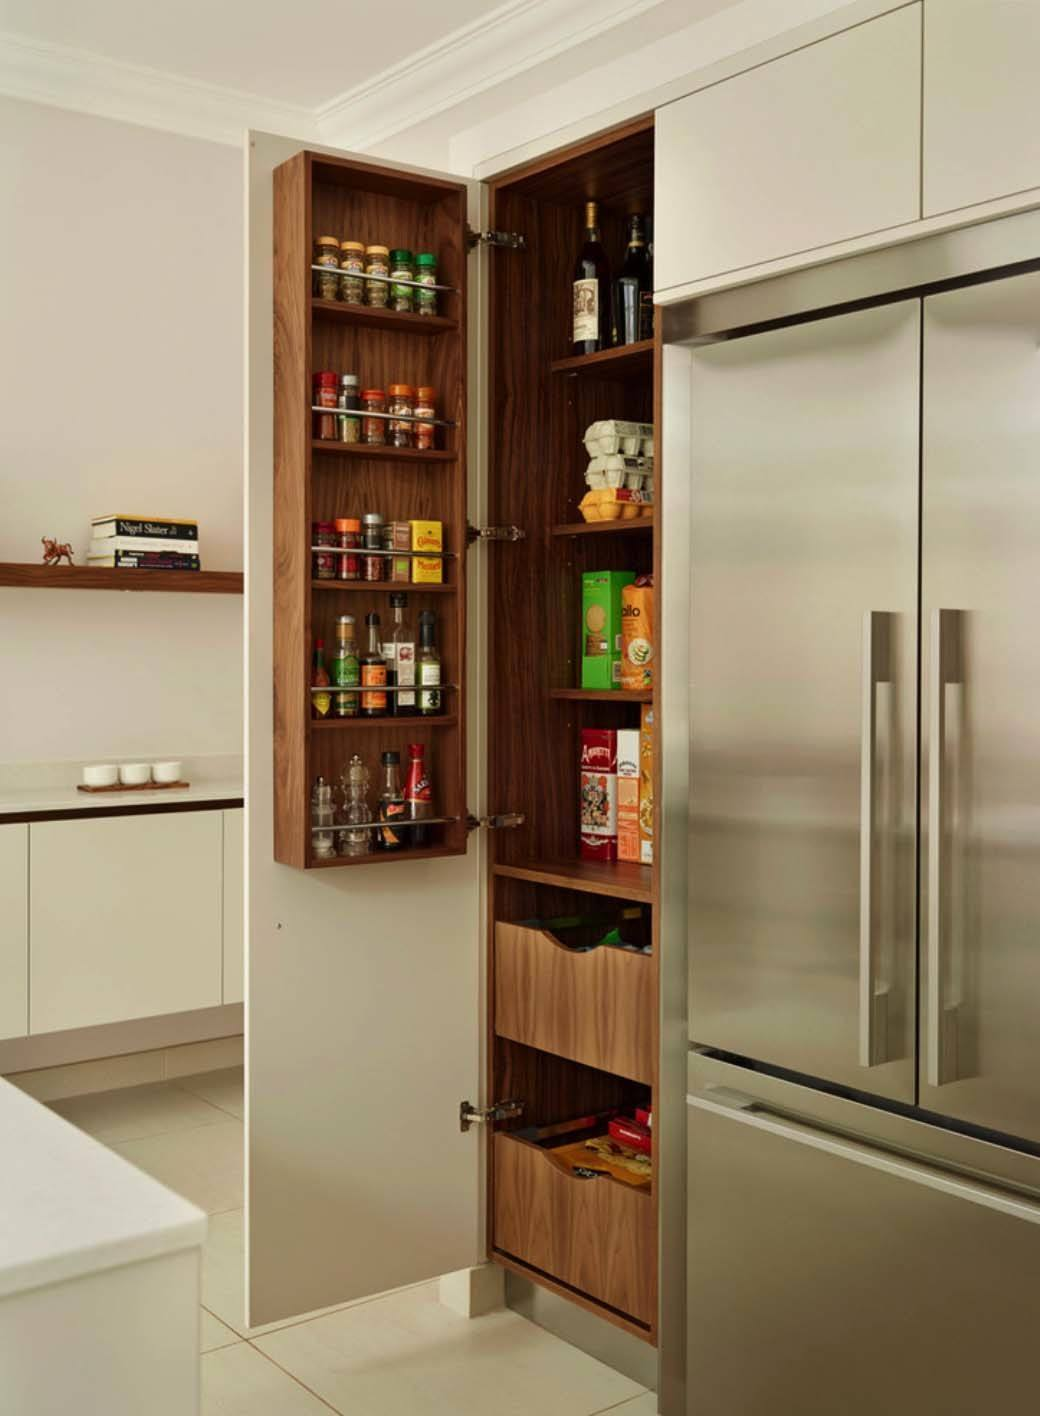 Kitchen-pantry-ideas-11-1 kindesign FDVVJZN